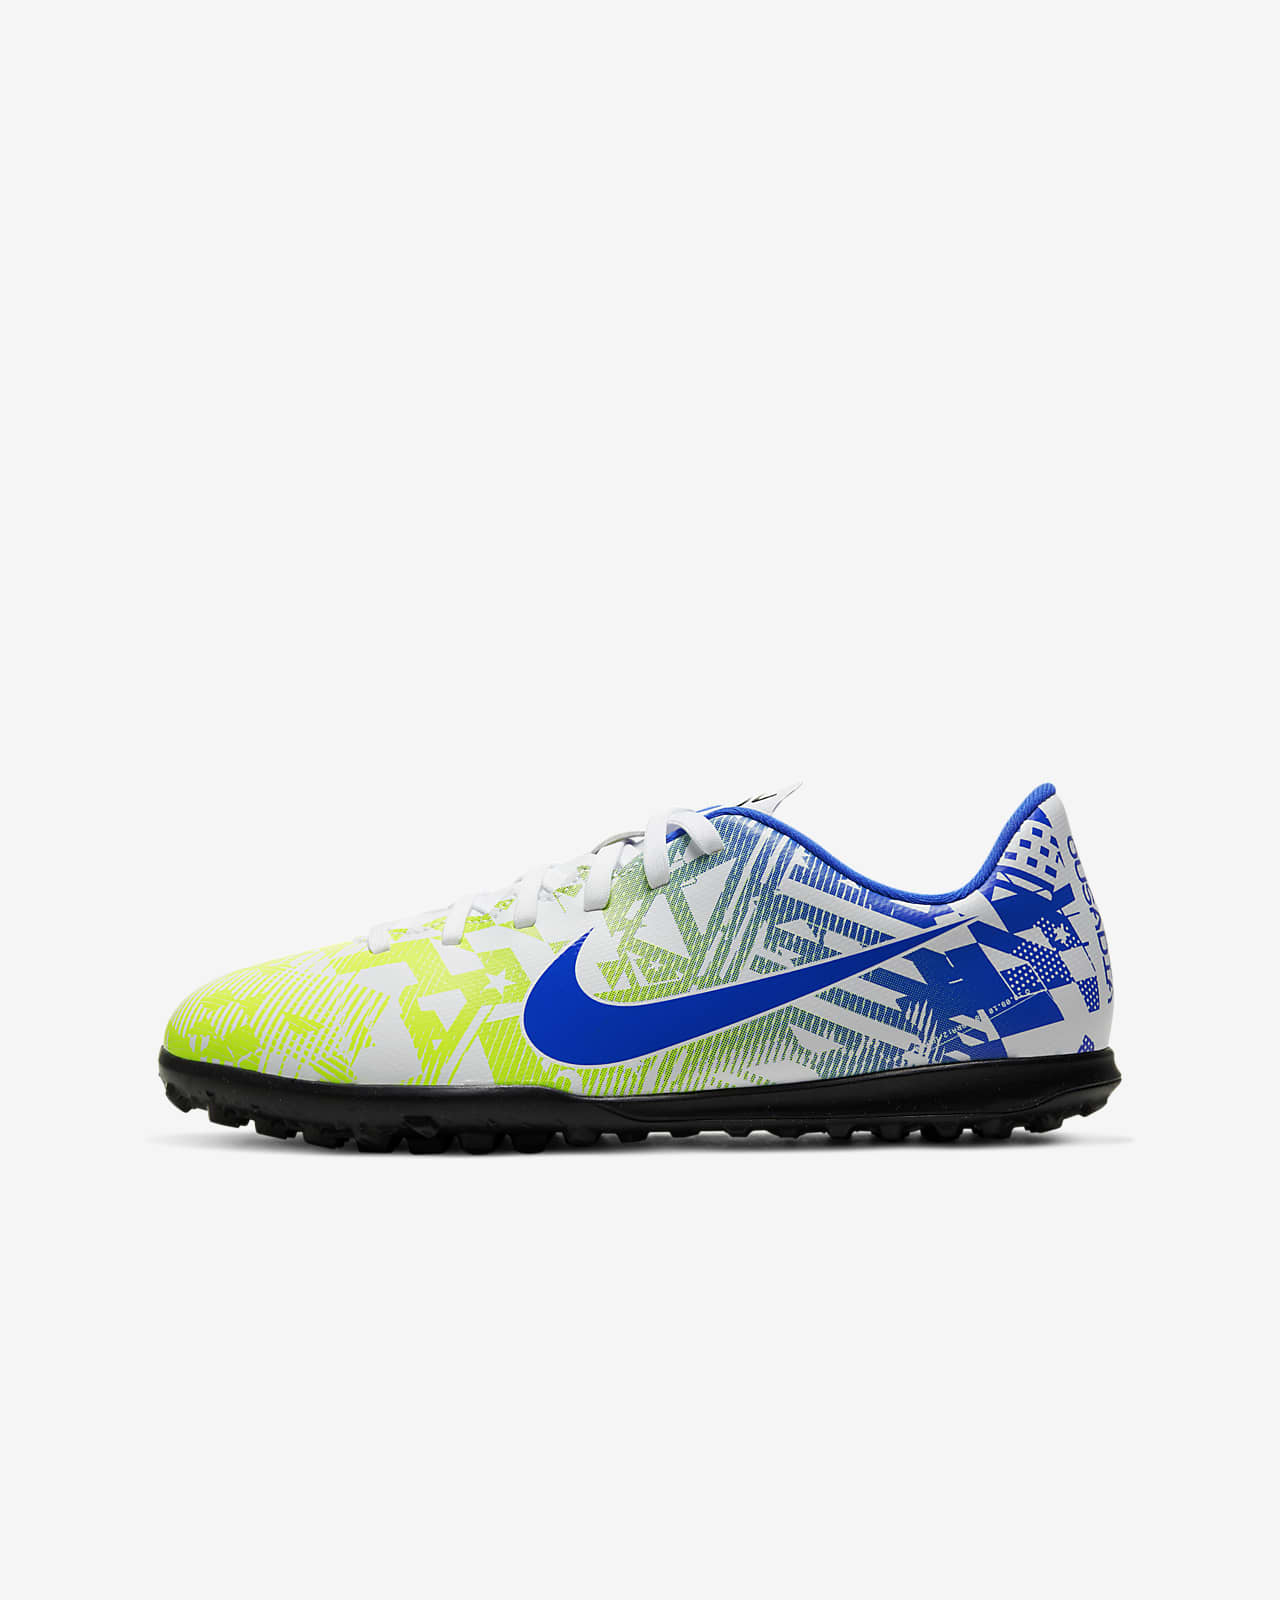 Nike Jr. Mercurial Vapor 13 Club Neymar Jr. TF Younger/Older Kids' Artificial-Turf Football Shoe